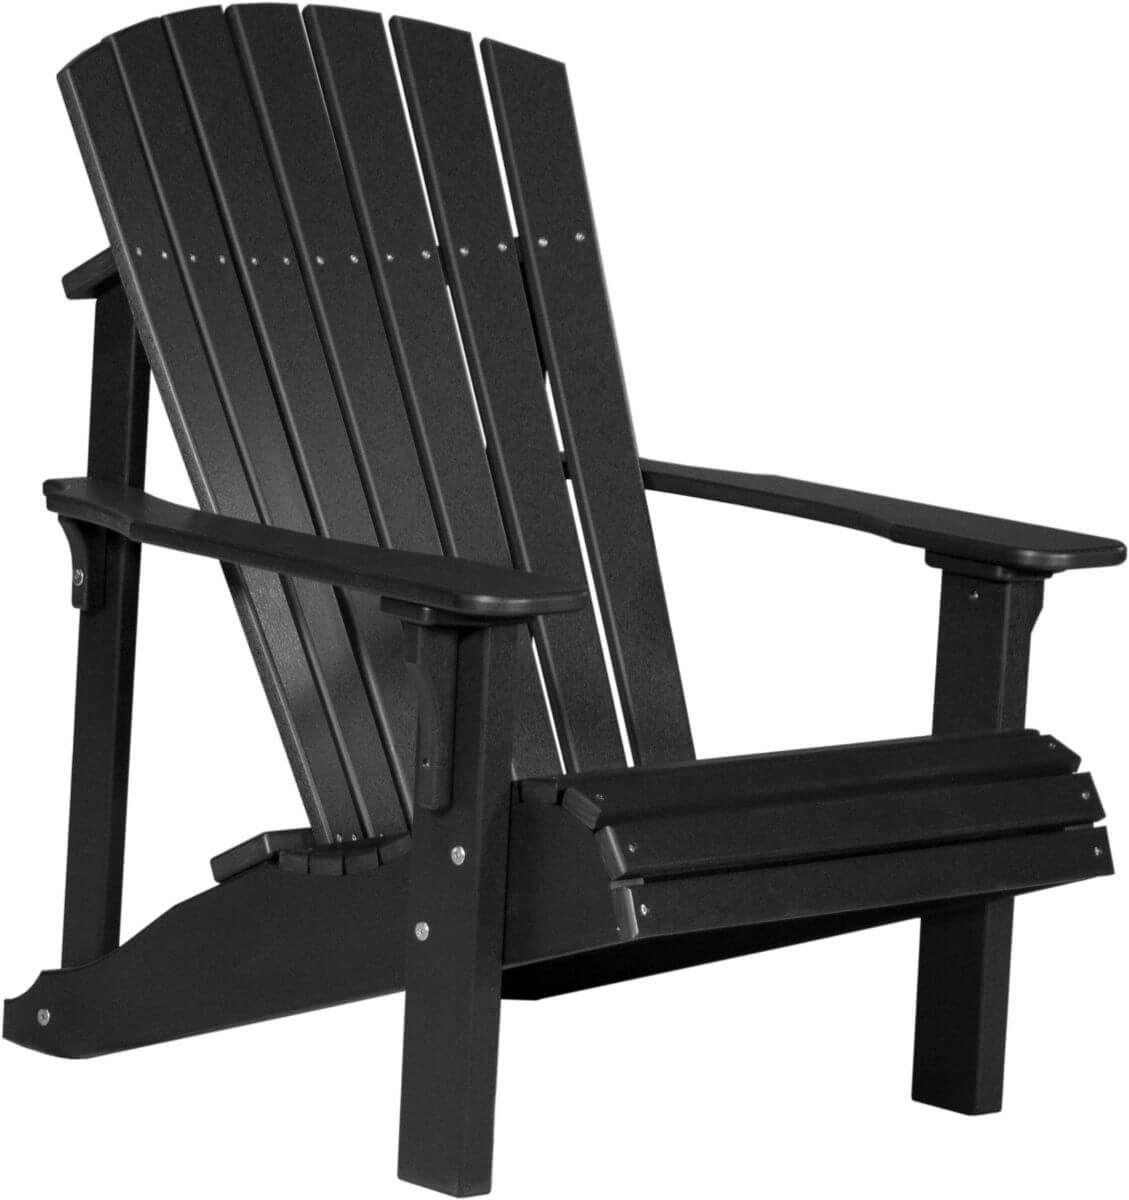 Black Rockaway Adirondack Chair